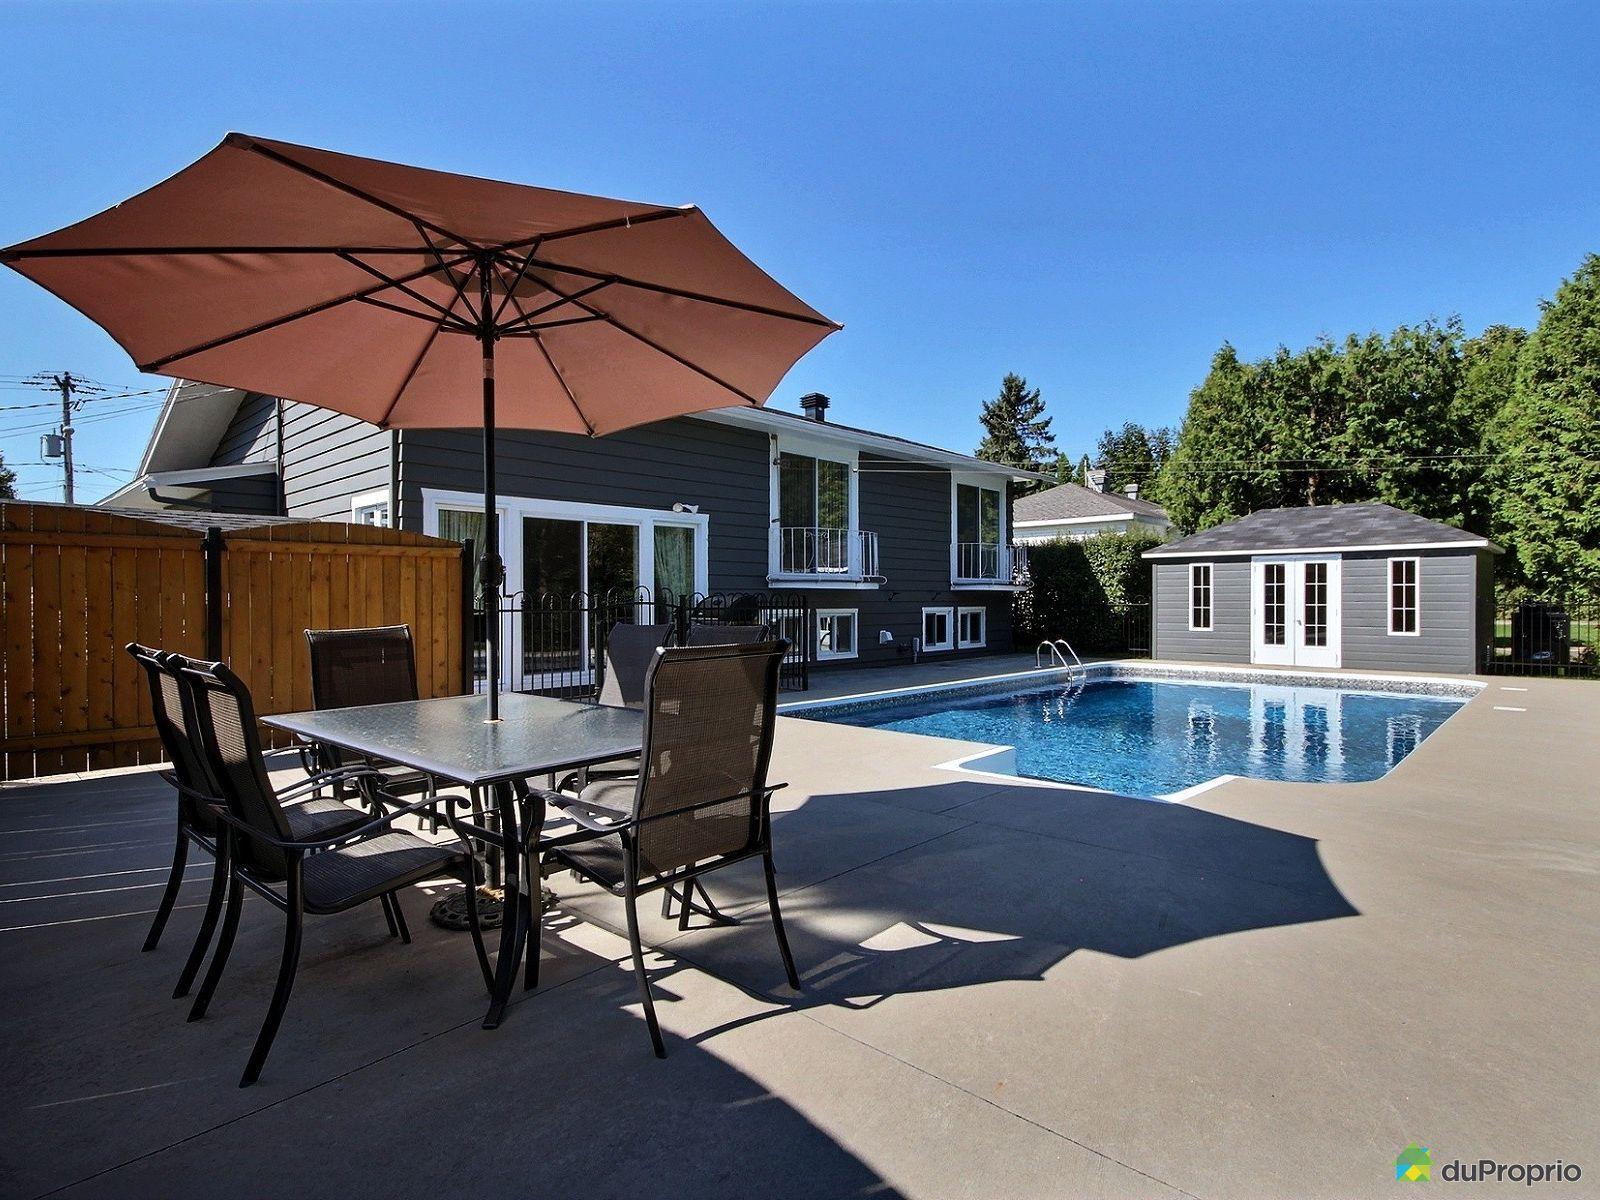 Maison vendre clermont 43 rue du parc immobilier for Balayeuse piscine creusee